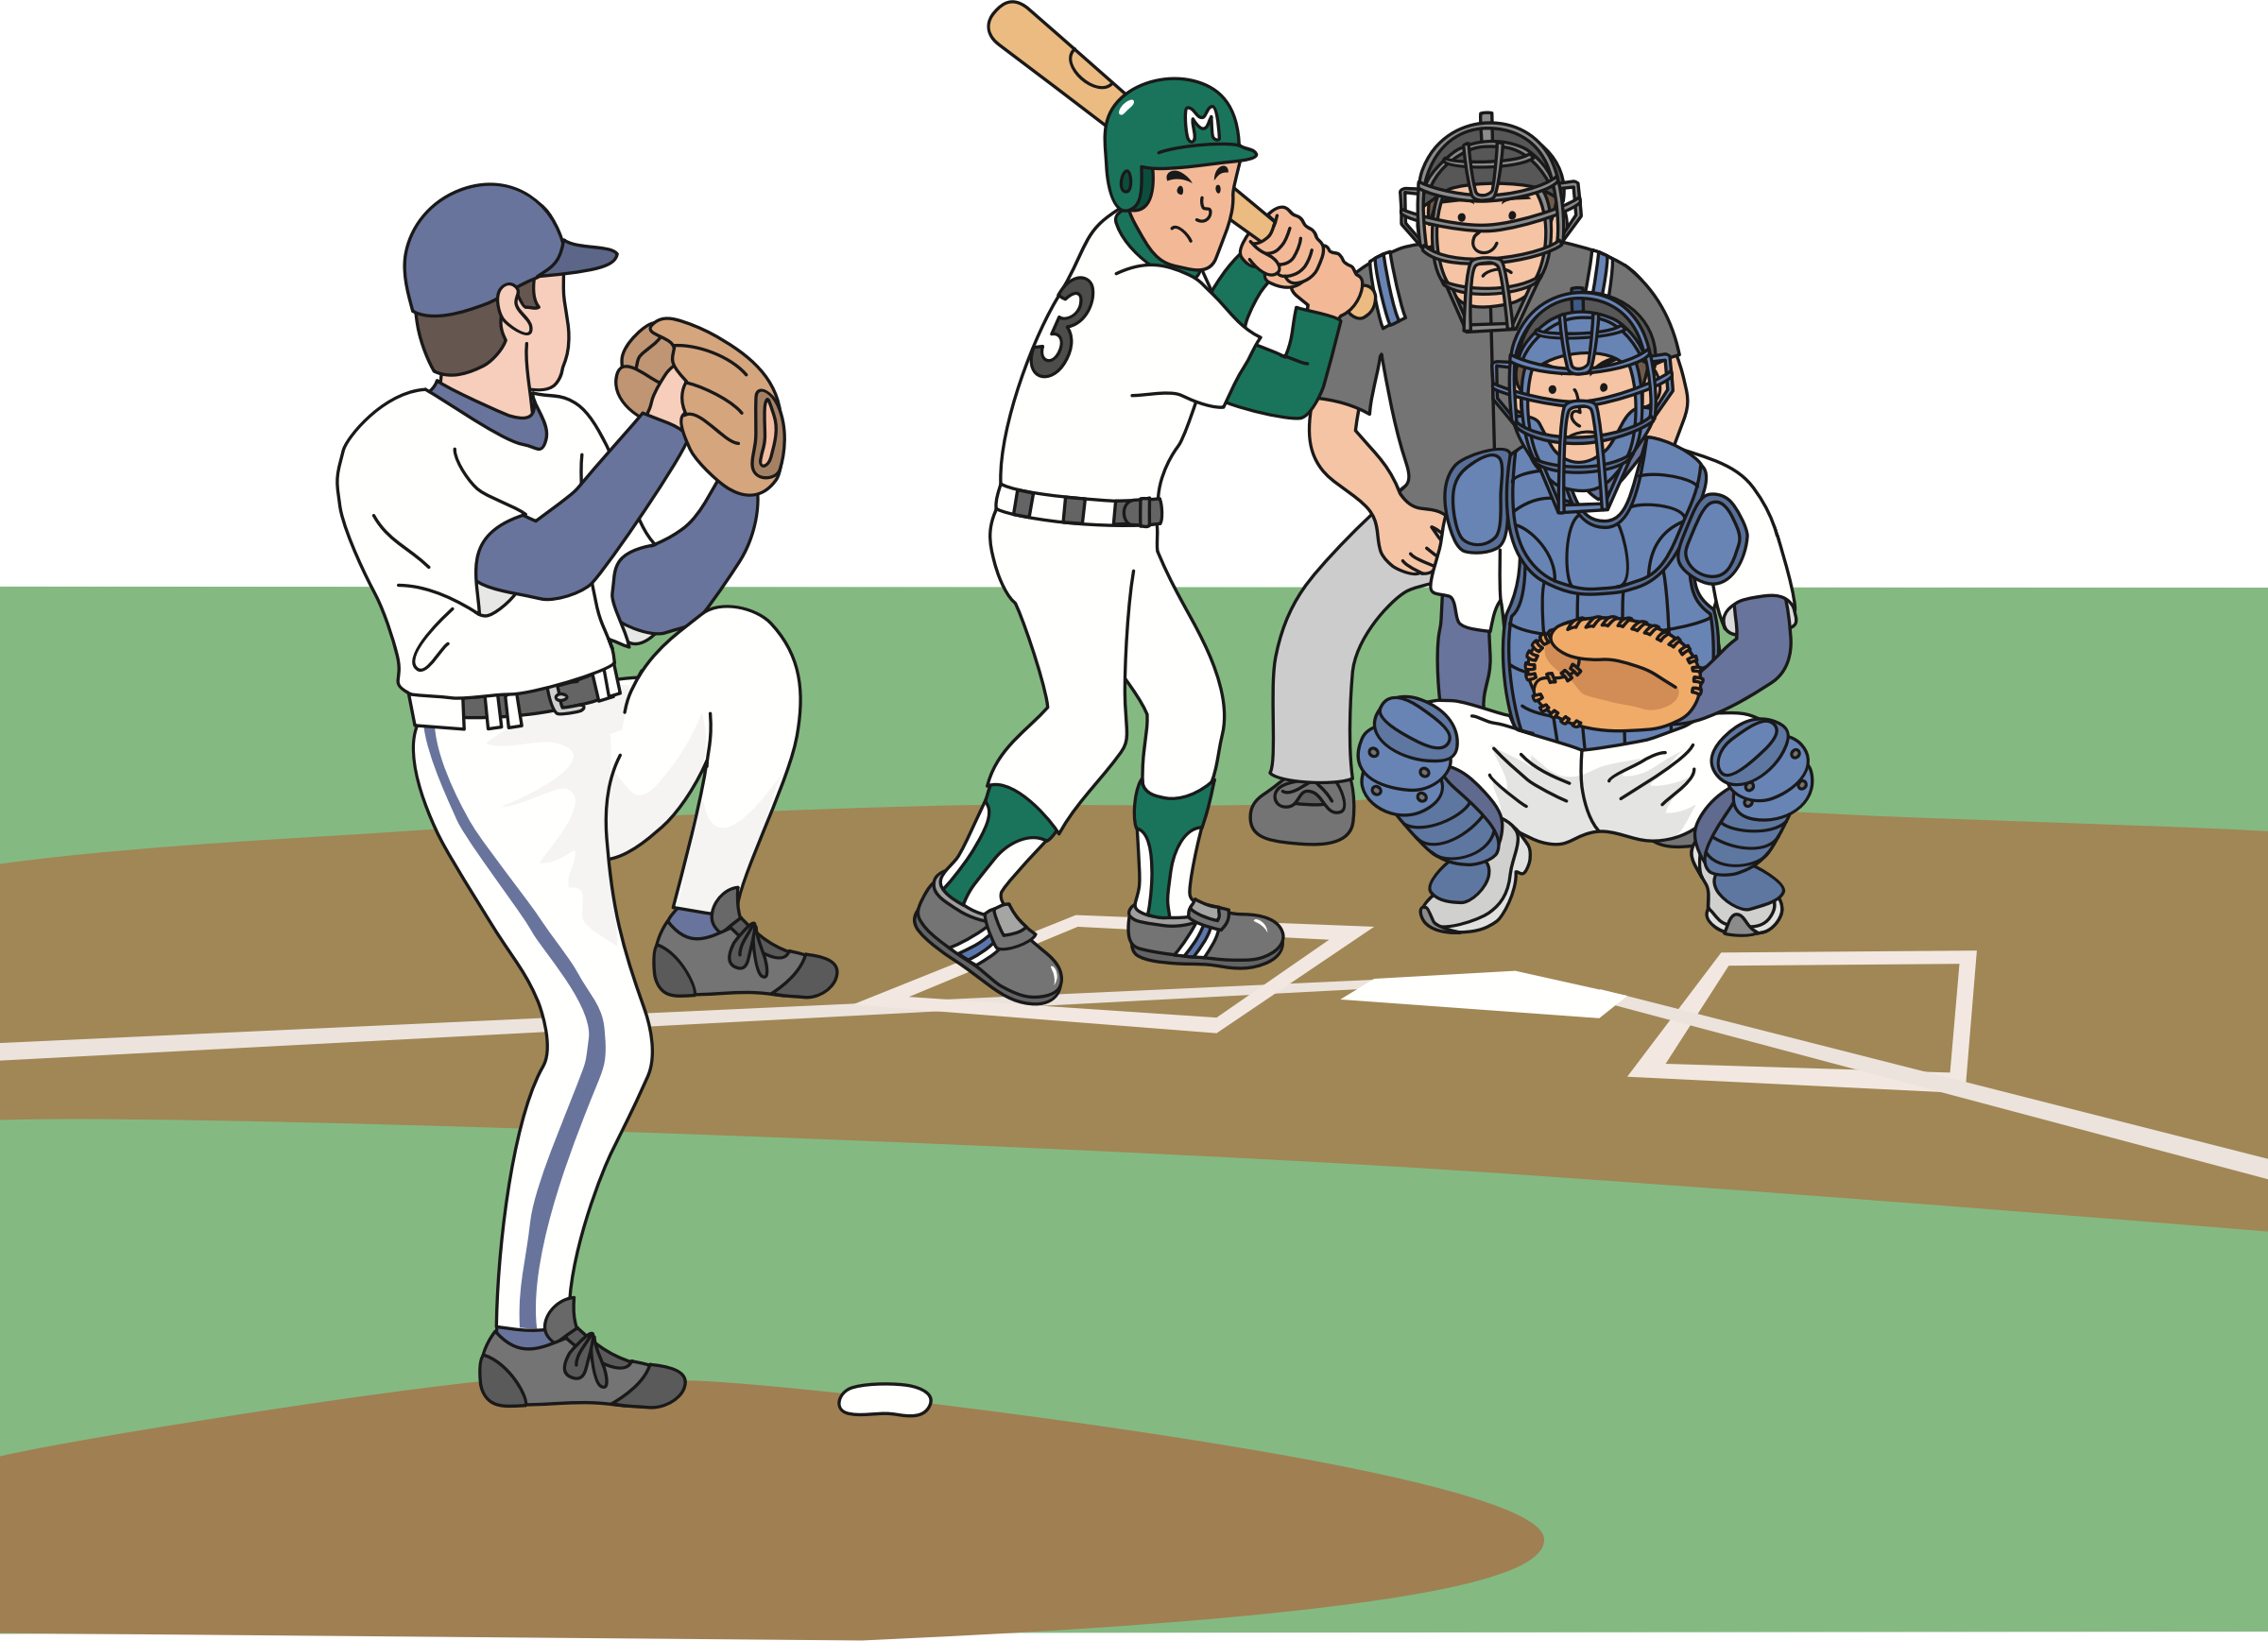 Baseball game clipart library Clipart - Baseball (#1) library